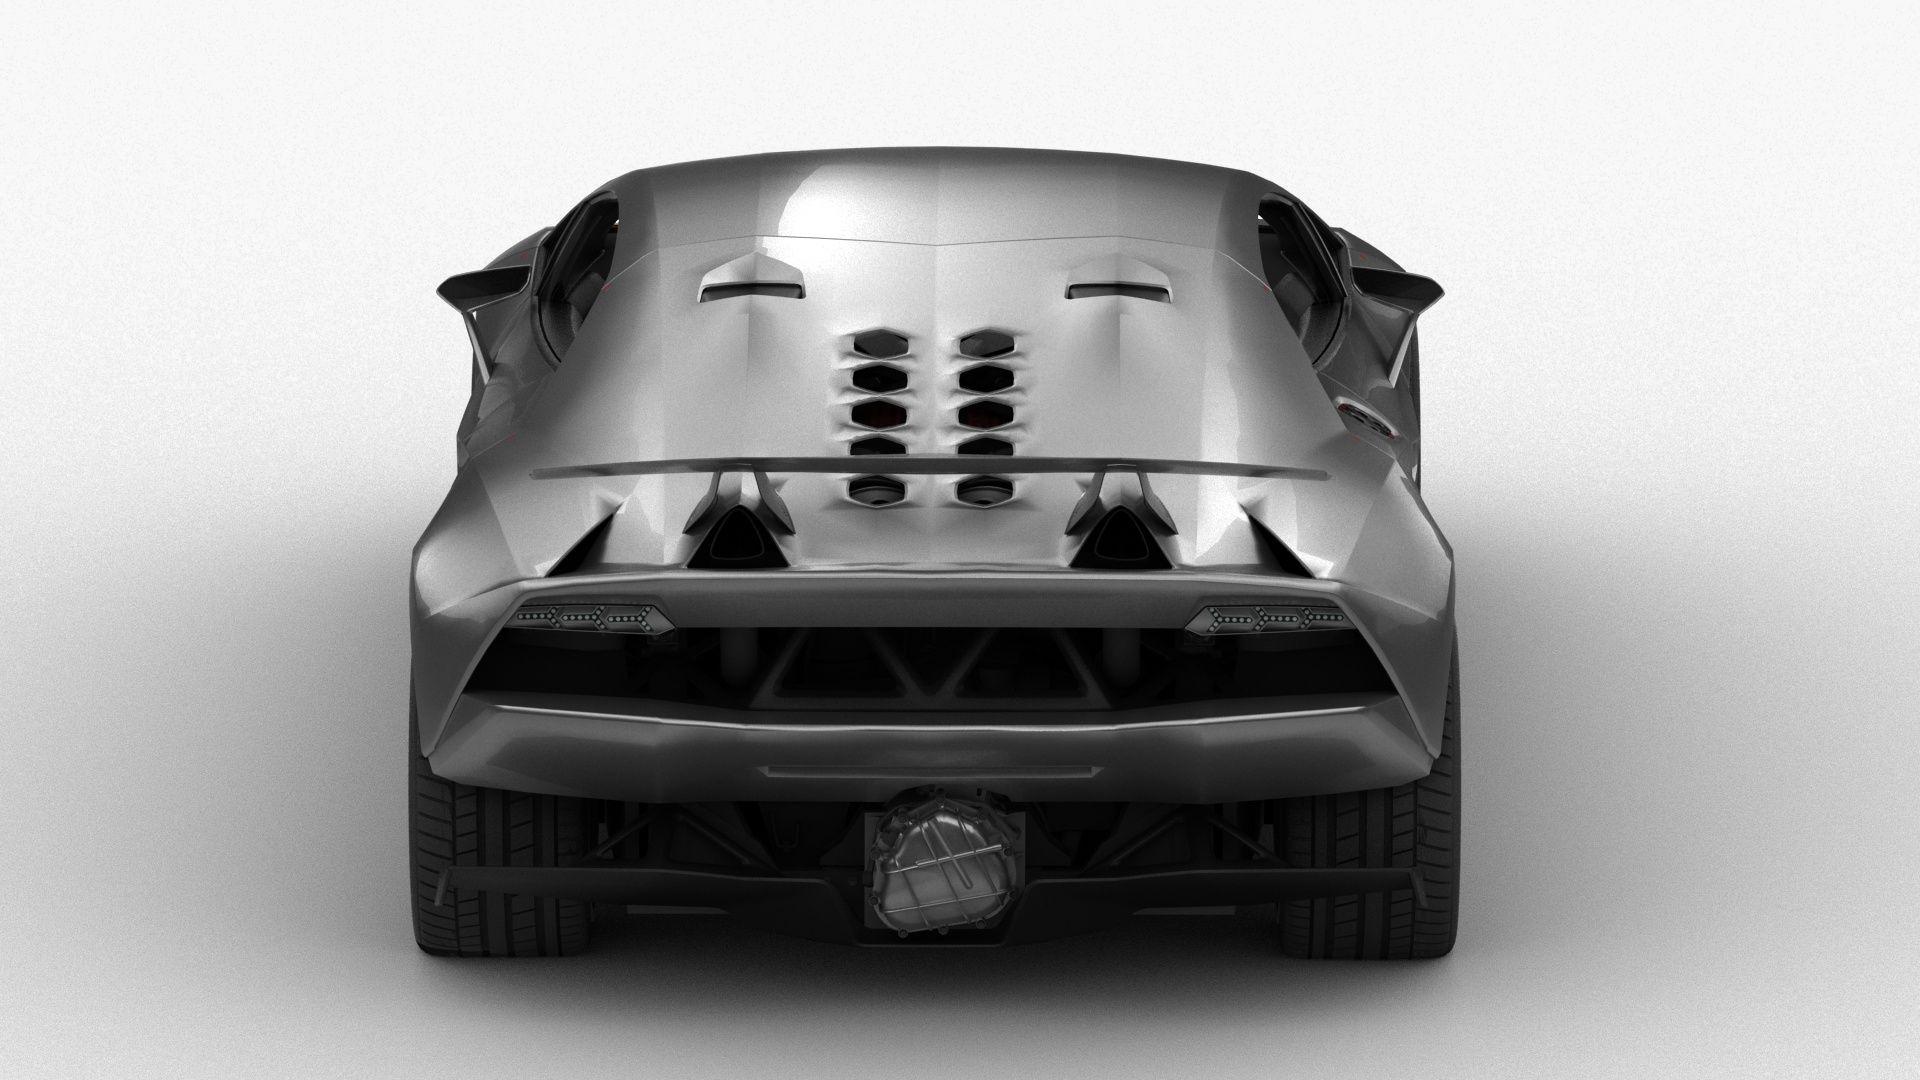 Lamborghini Sesto Elemento 2012 #Sesto, #Lamborghini, #Elemento #lamborghinisestoelemento